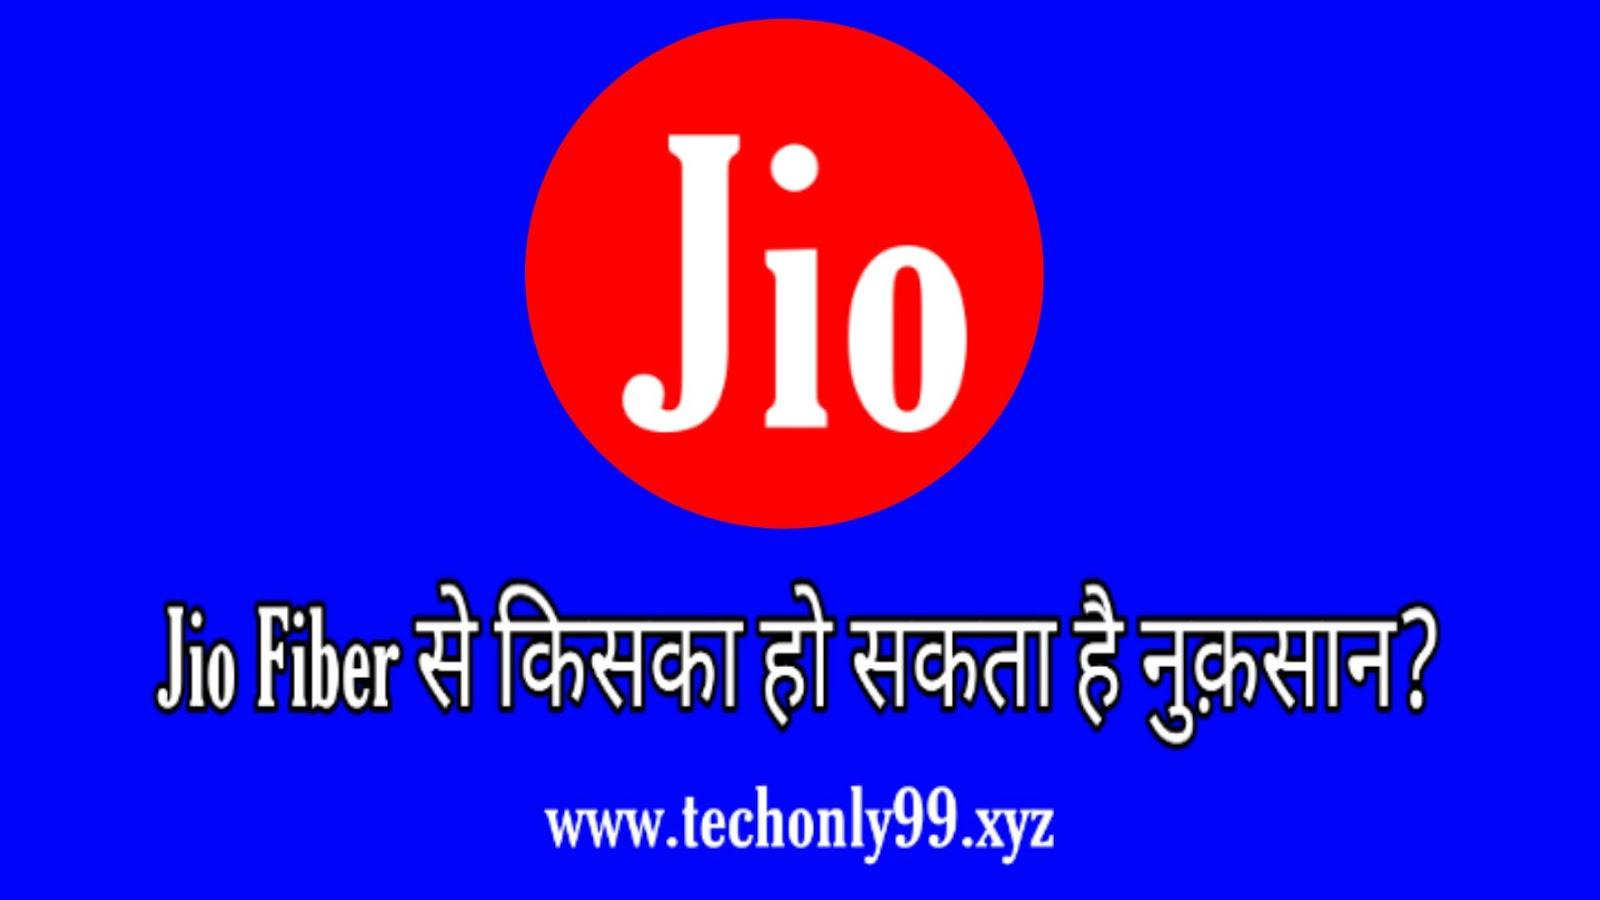 जिओ फाइबर क्या है, क्या फायदे, किनका हो सकता है नुकसान। Jio fiber full details